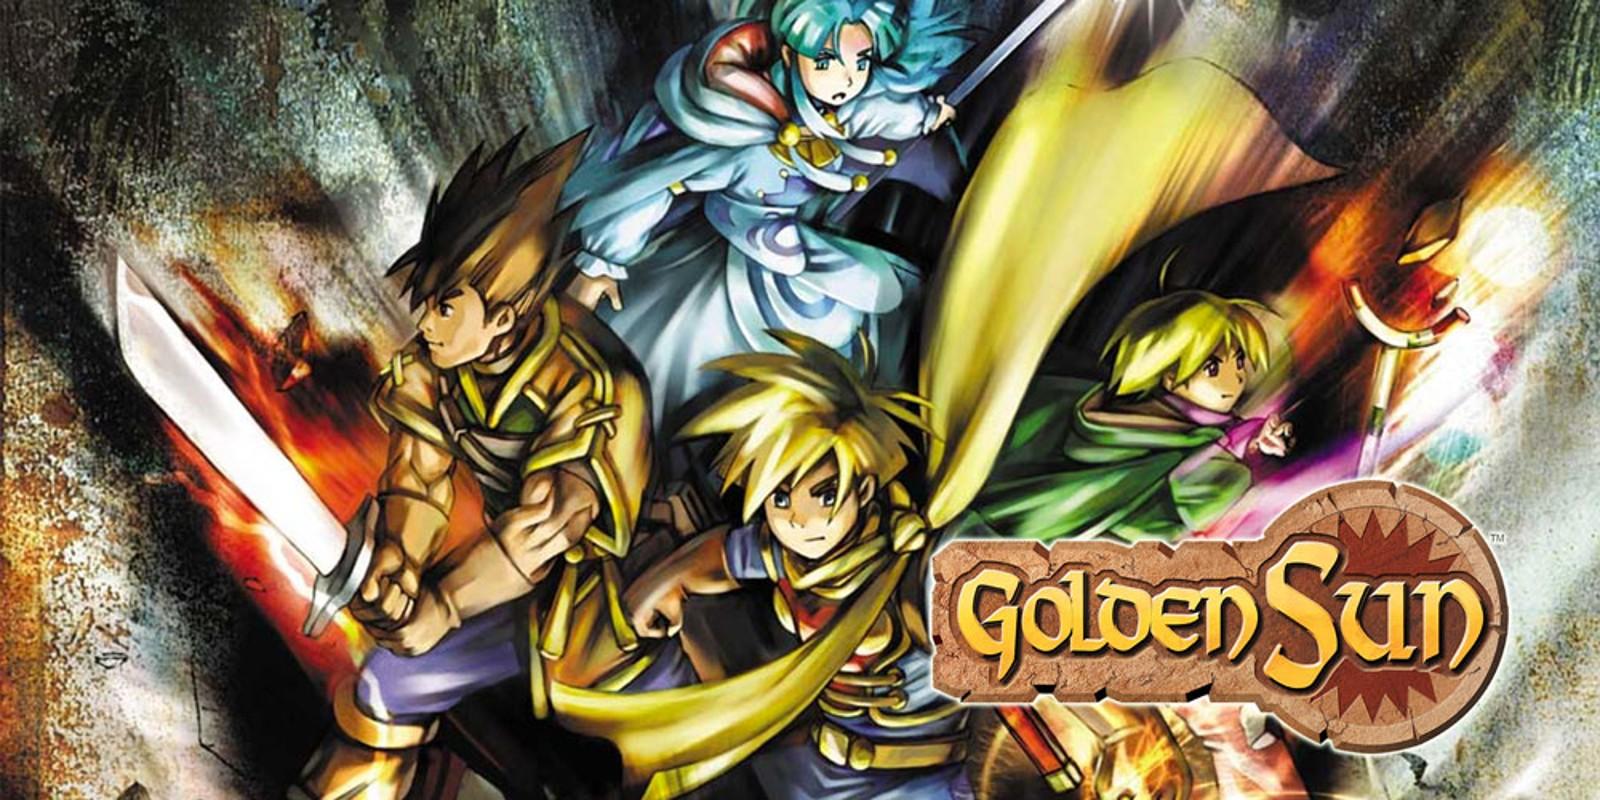 Wii U Golden Sun